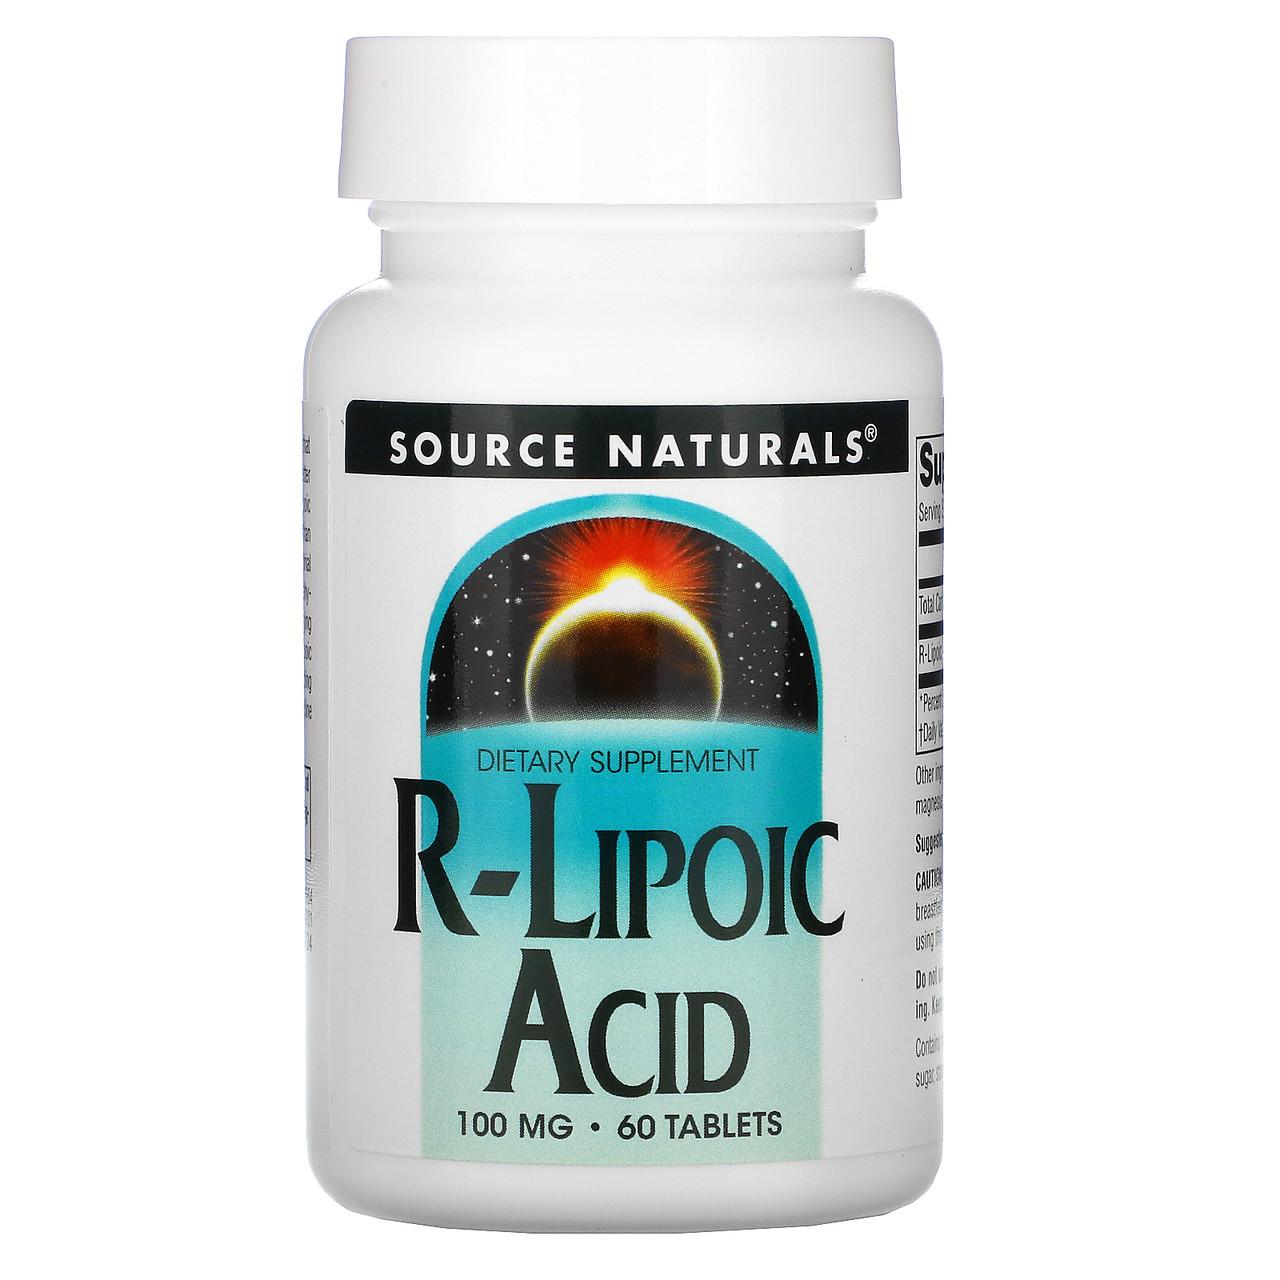 R липоевая кислота, R-Lipoic Acid, Source Naturals, 100 мг, 60 таб.